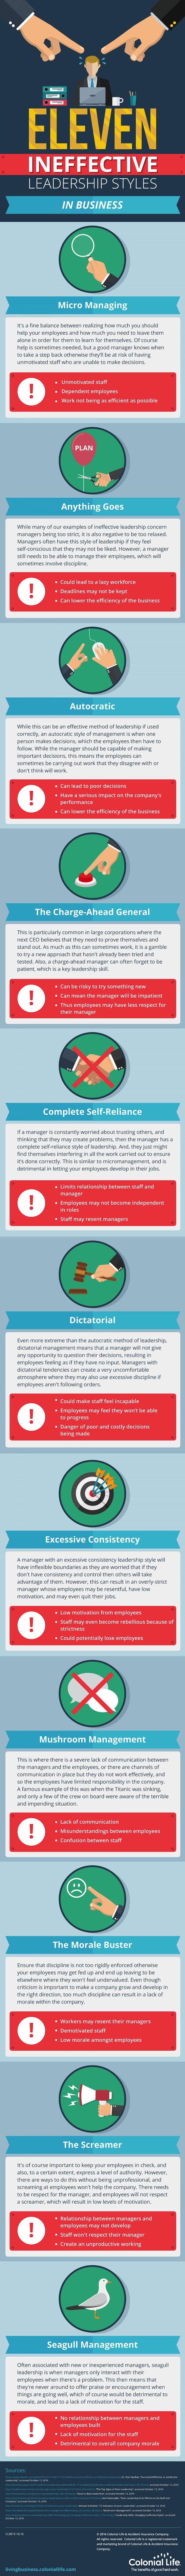 inefectivos-estilos-de-liderazgo